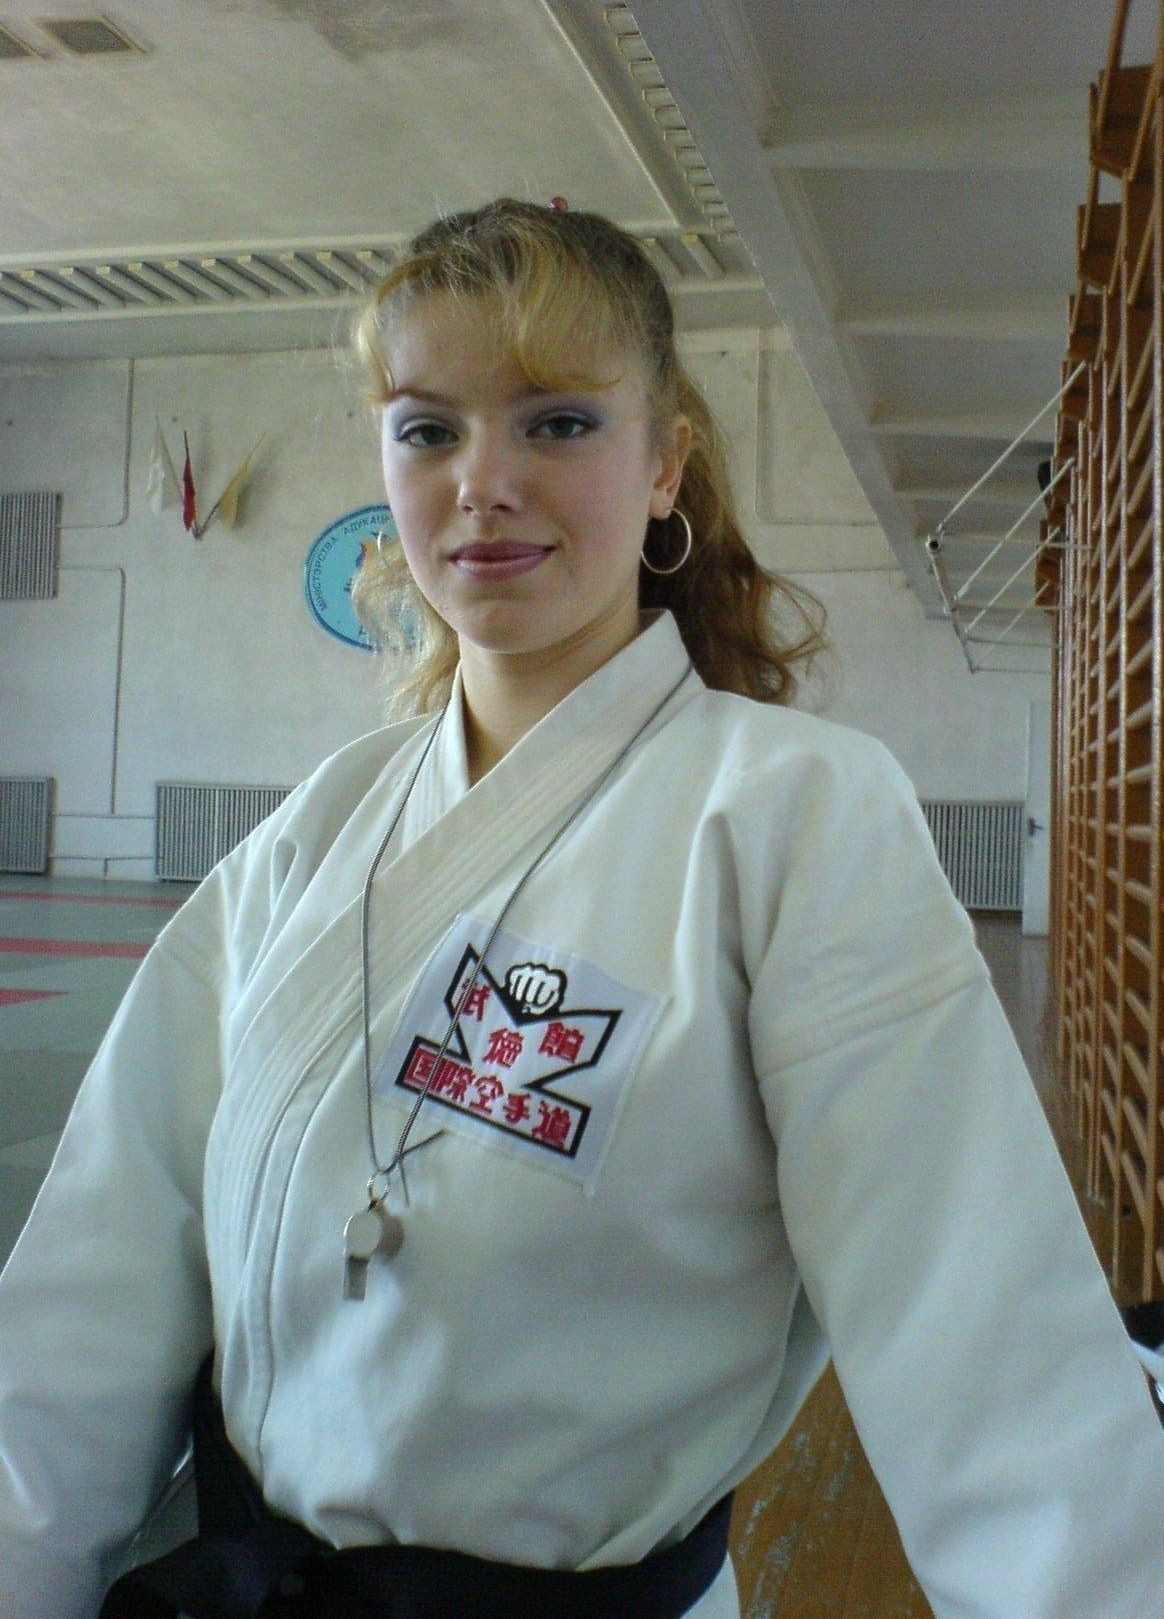 https://i1.wp.com/upload.wikimedia.org/wikipedia/commons/1/17/Liudmila_Andreevna_VEDERNIKOVA.jpg